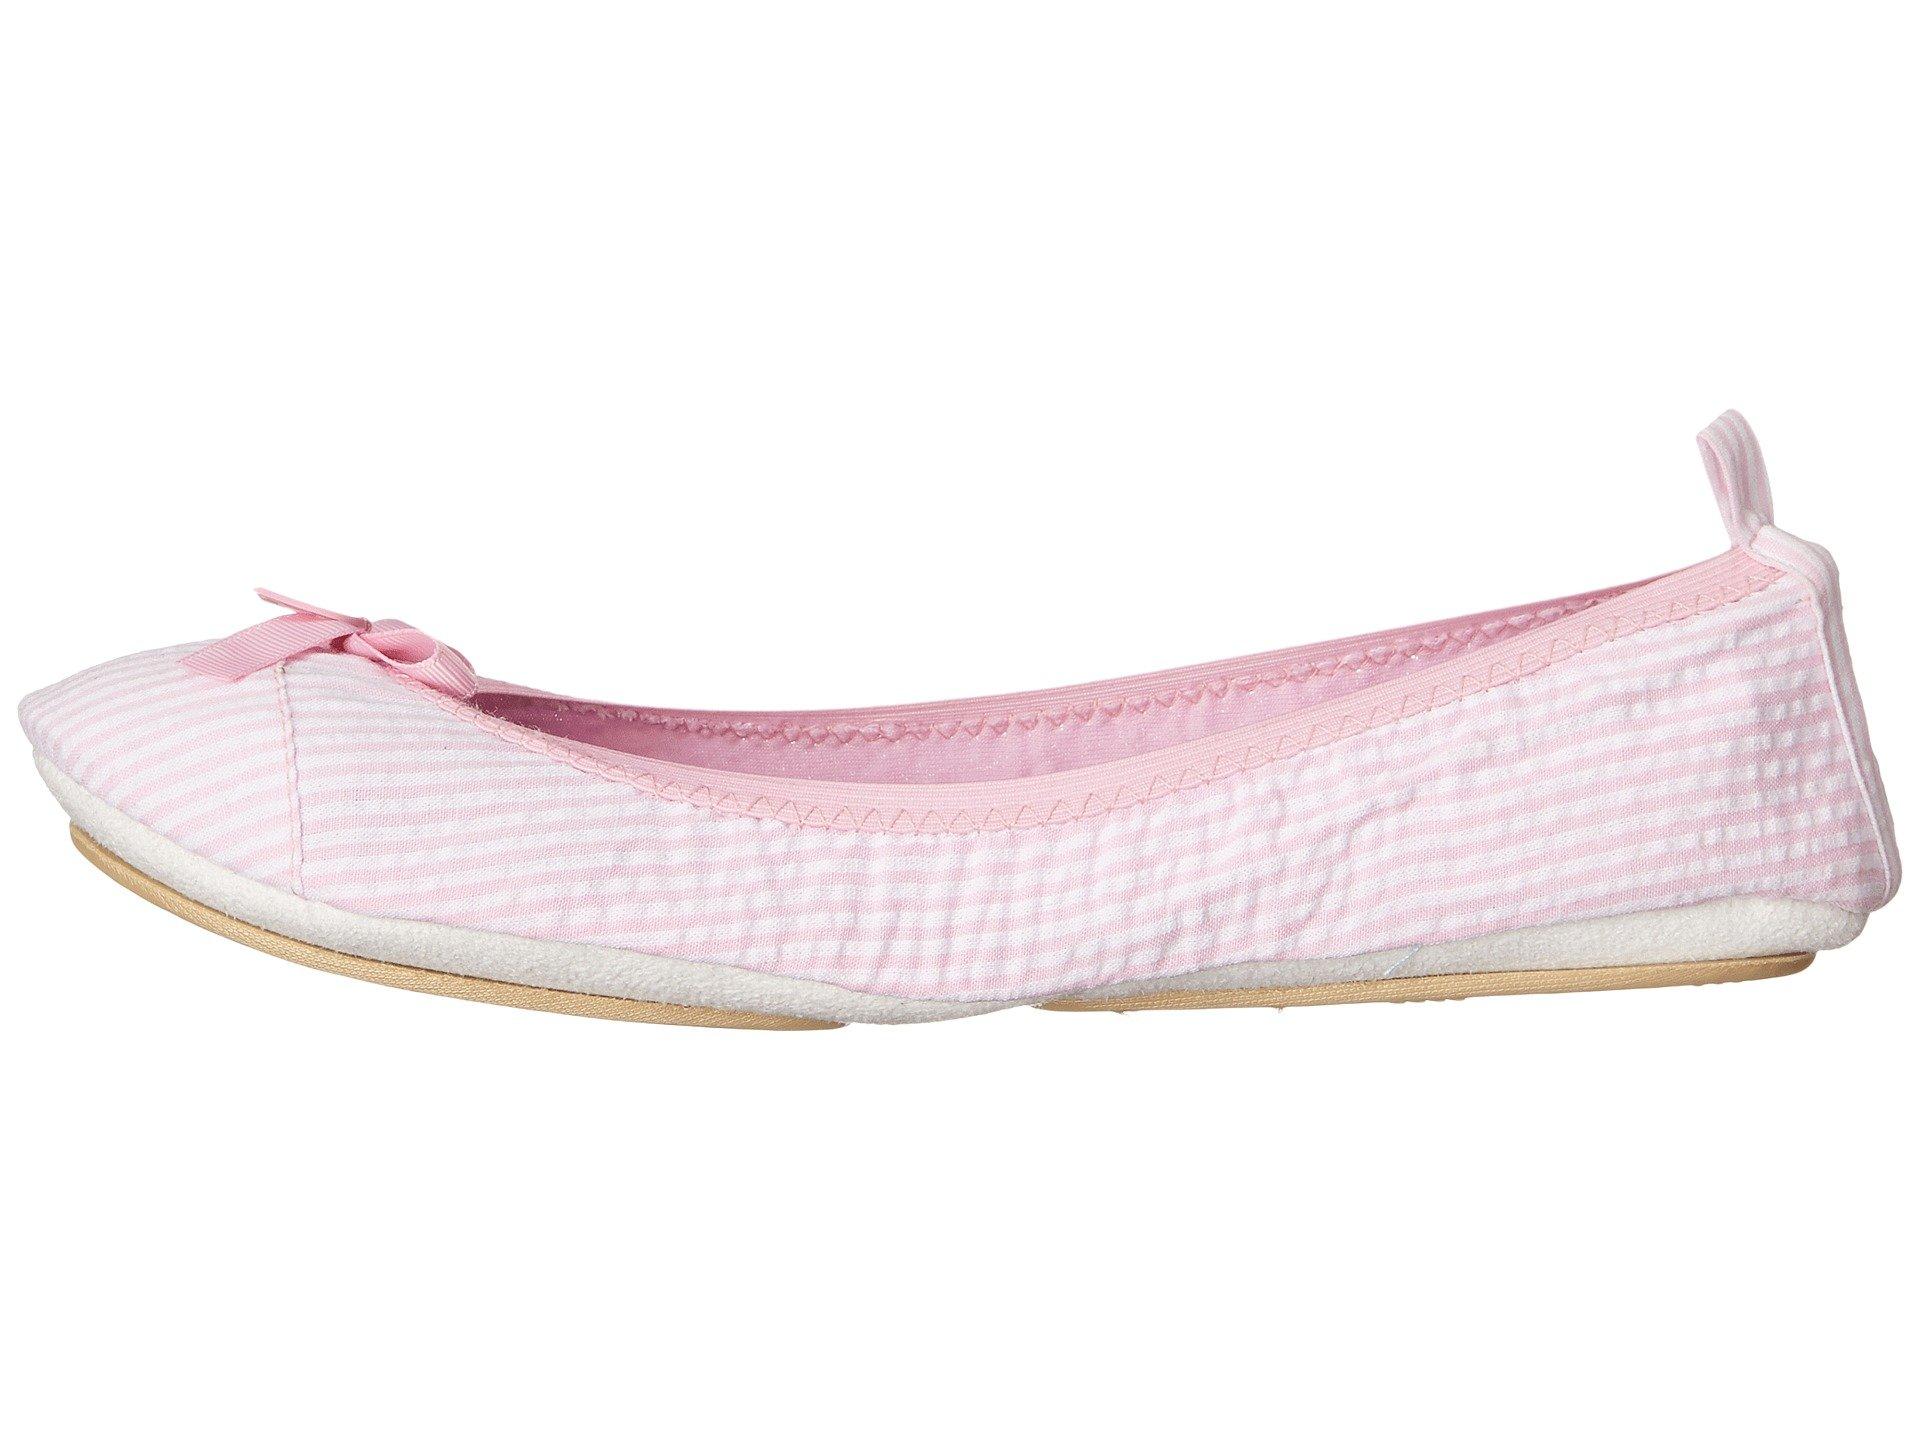 Bedroom Athletics Keira Slippers